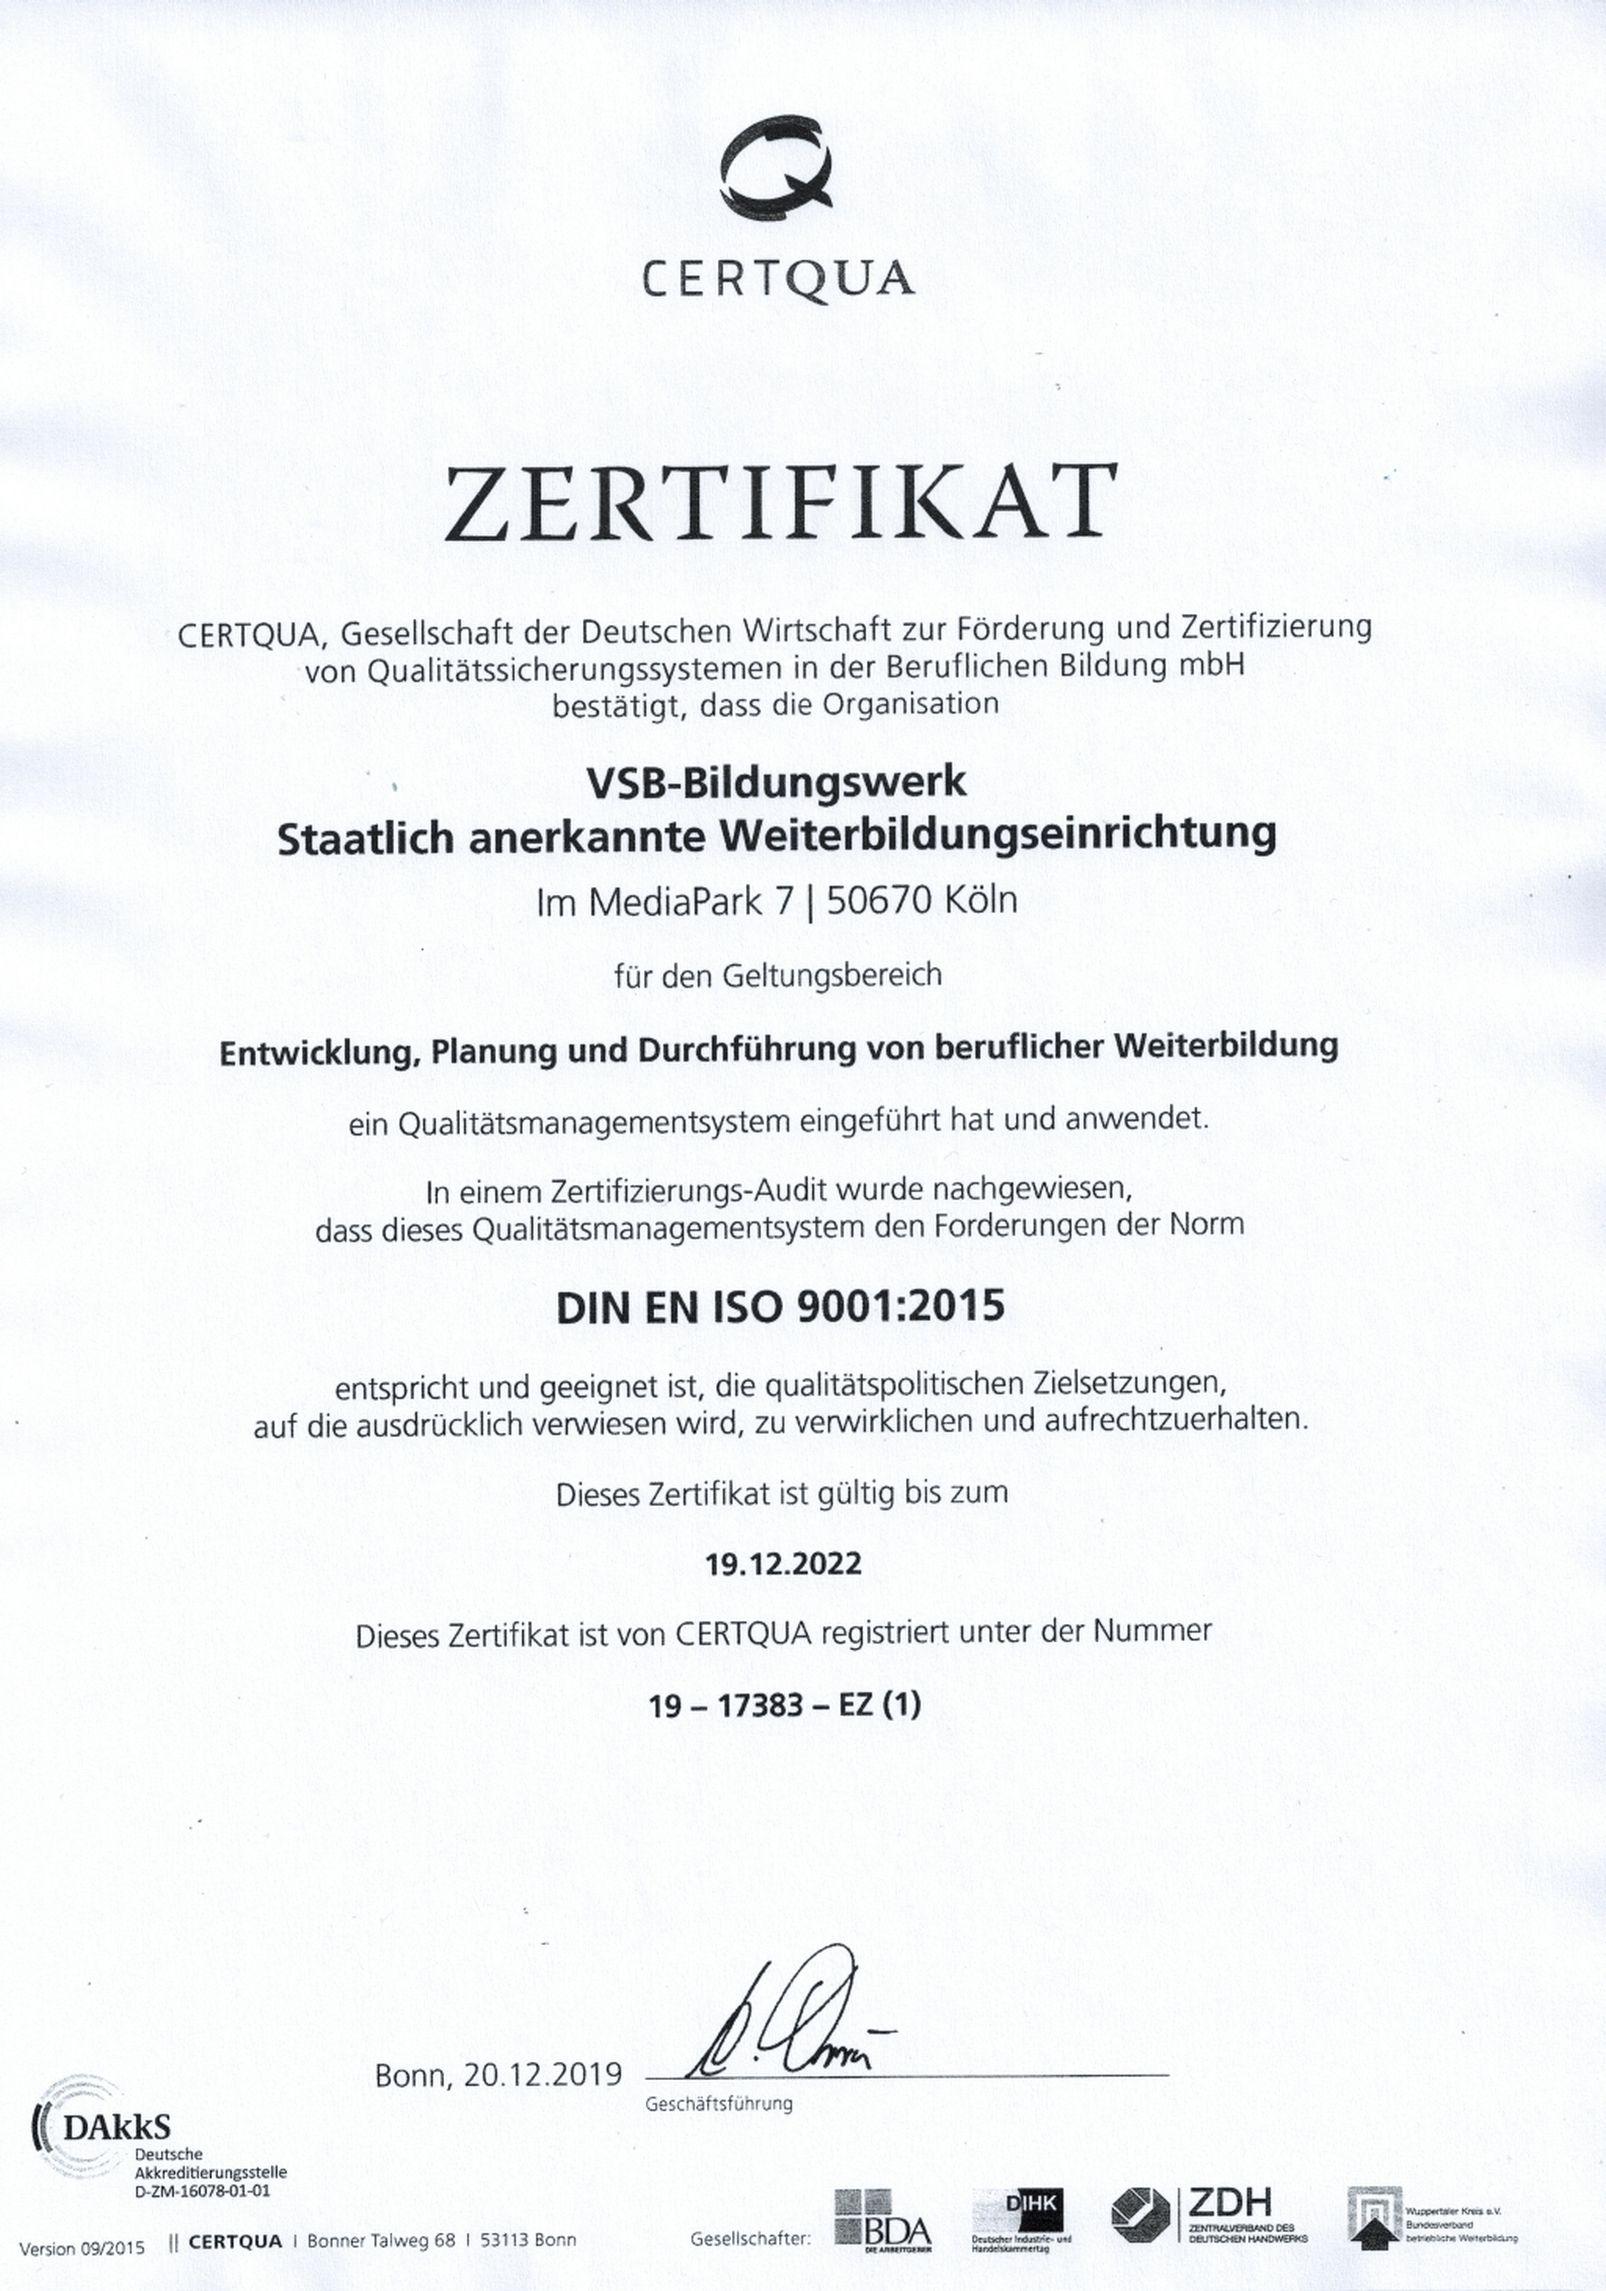 Zertifikat_Certqua